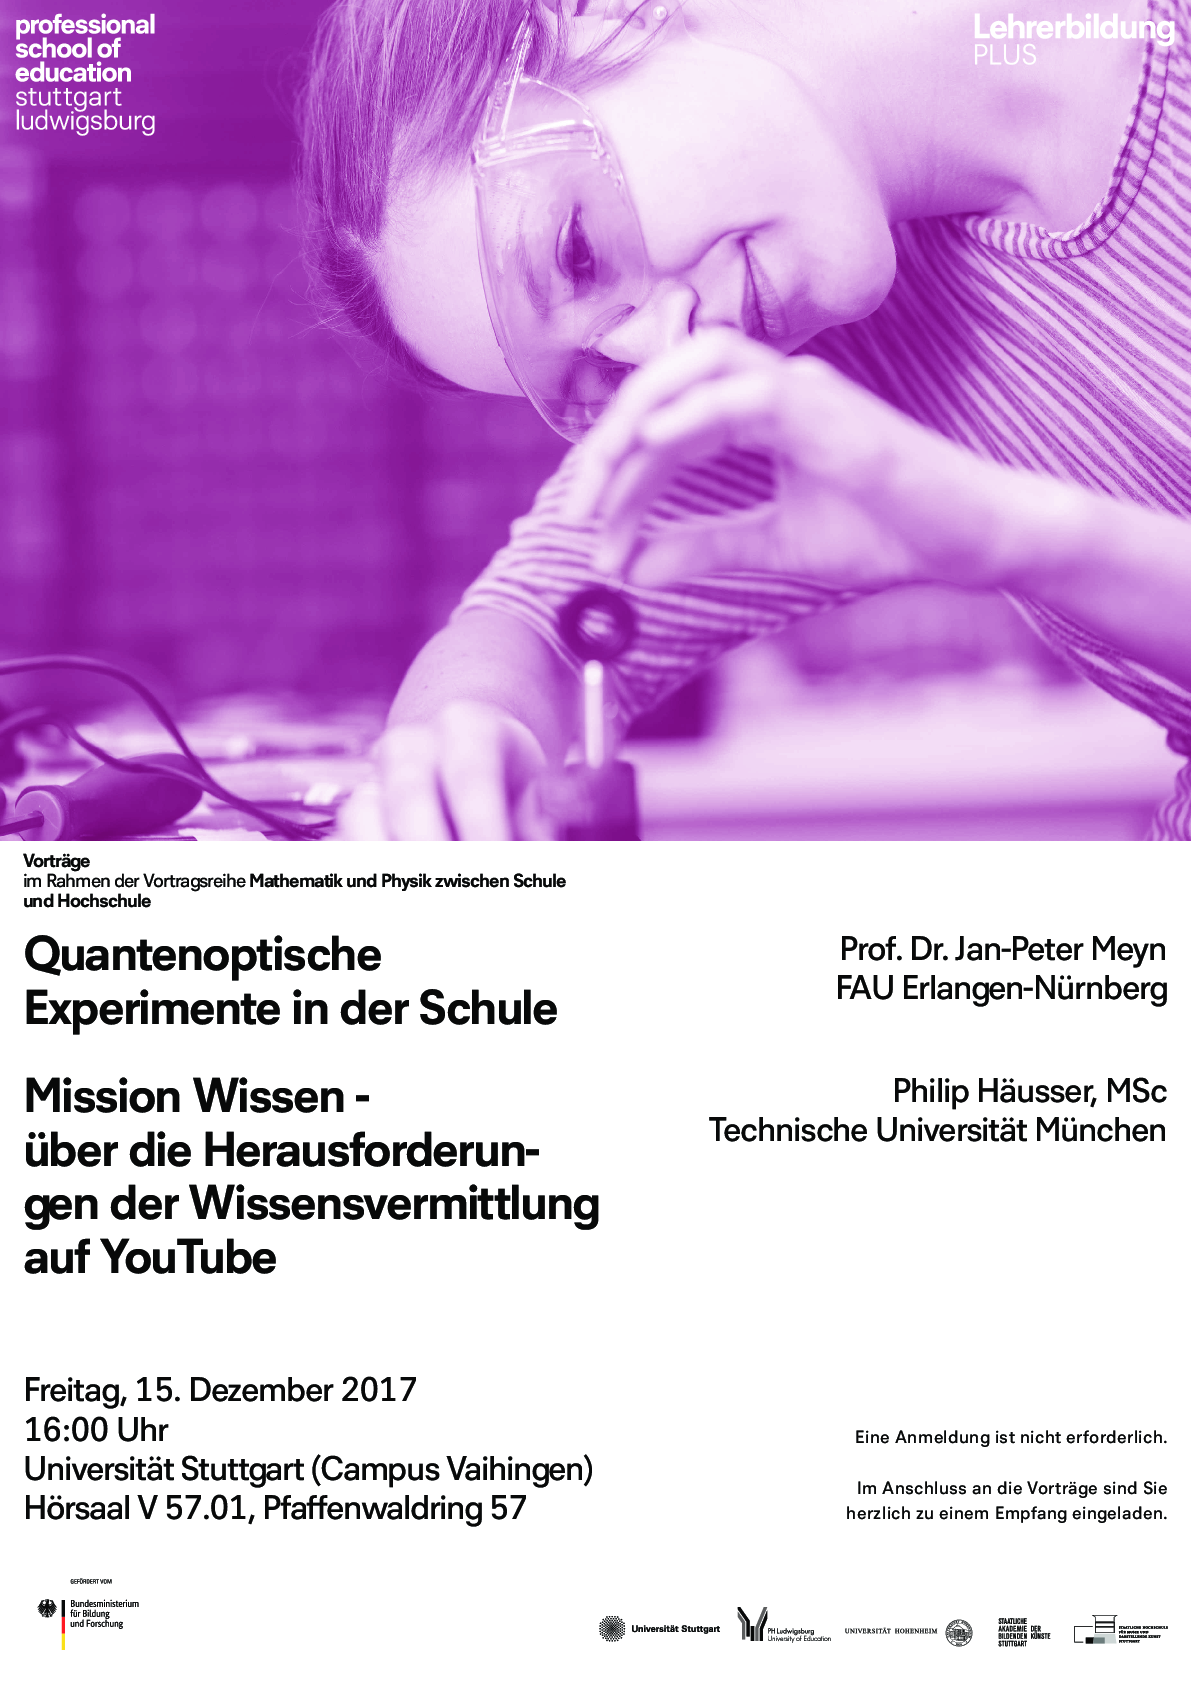 https://opencms.uni-stuttgart.de/fak8/fakultaet_neu/events/event_content/poster2017-12-15-UniSTGT.png